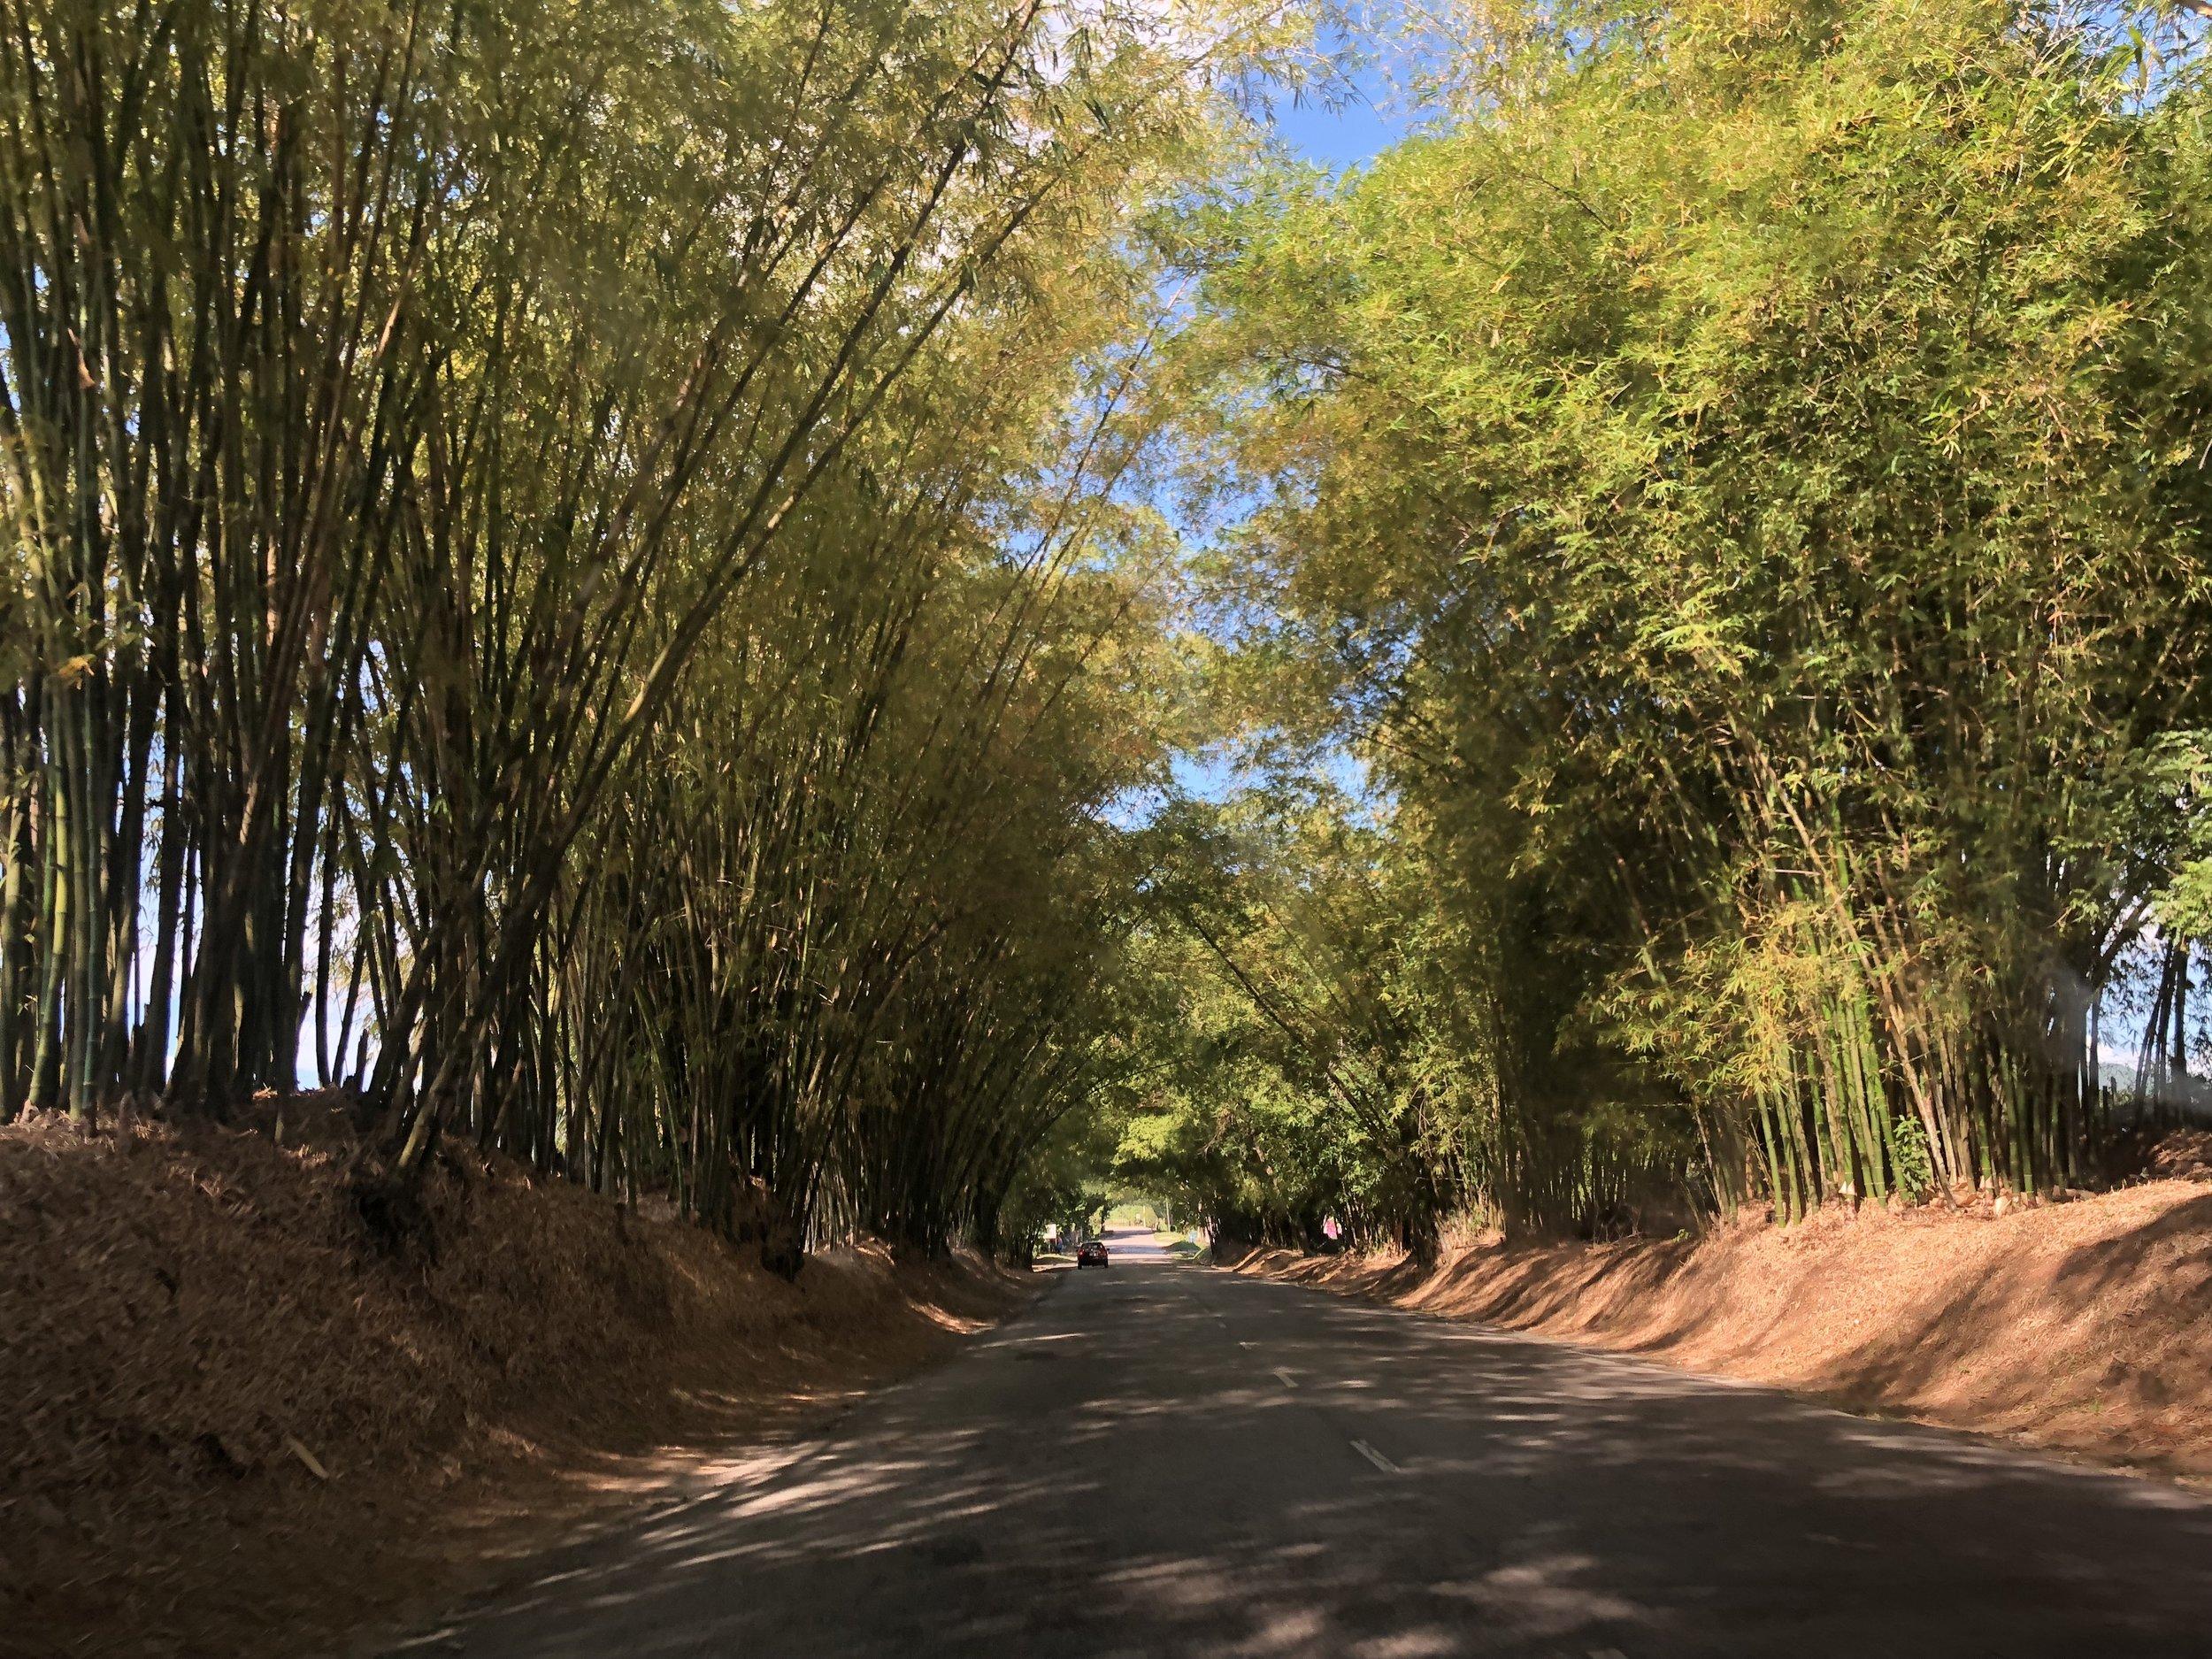 Sugarcane lined streets (JAMAICA, 2018,  ©  JOEL ANG PHOTOGRAPHY)